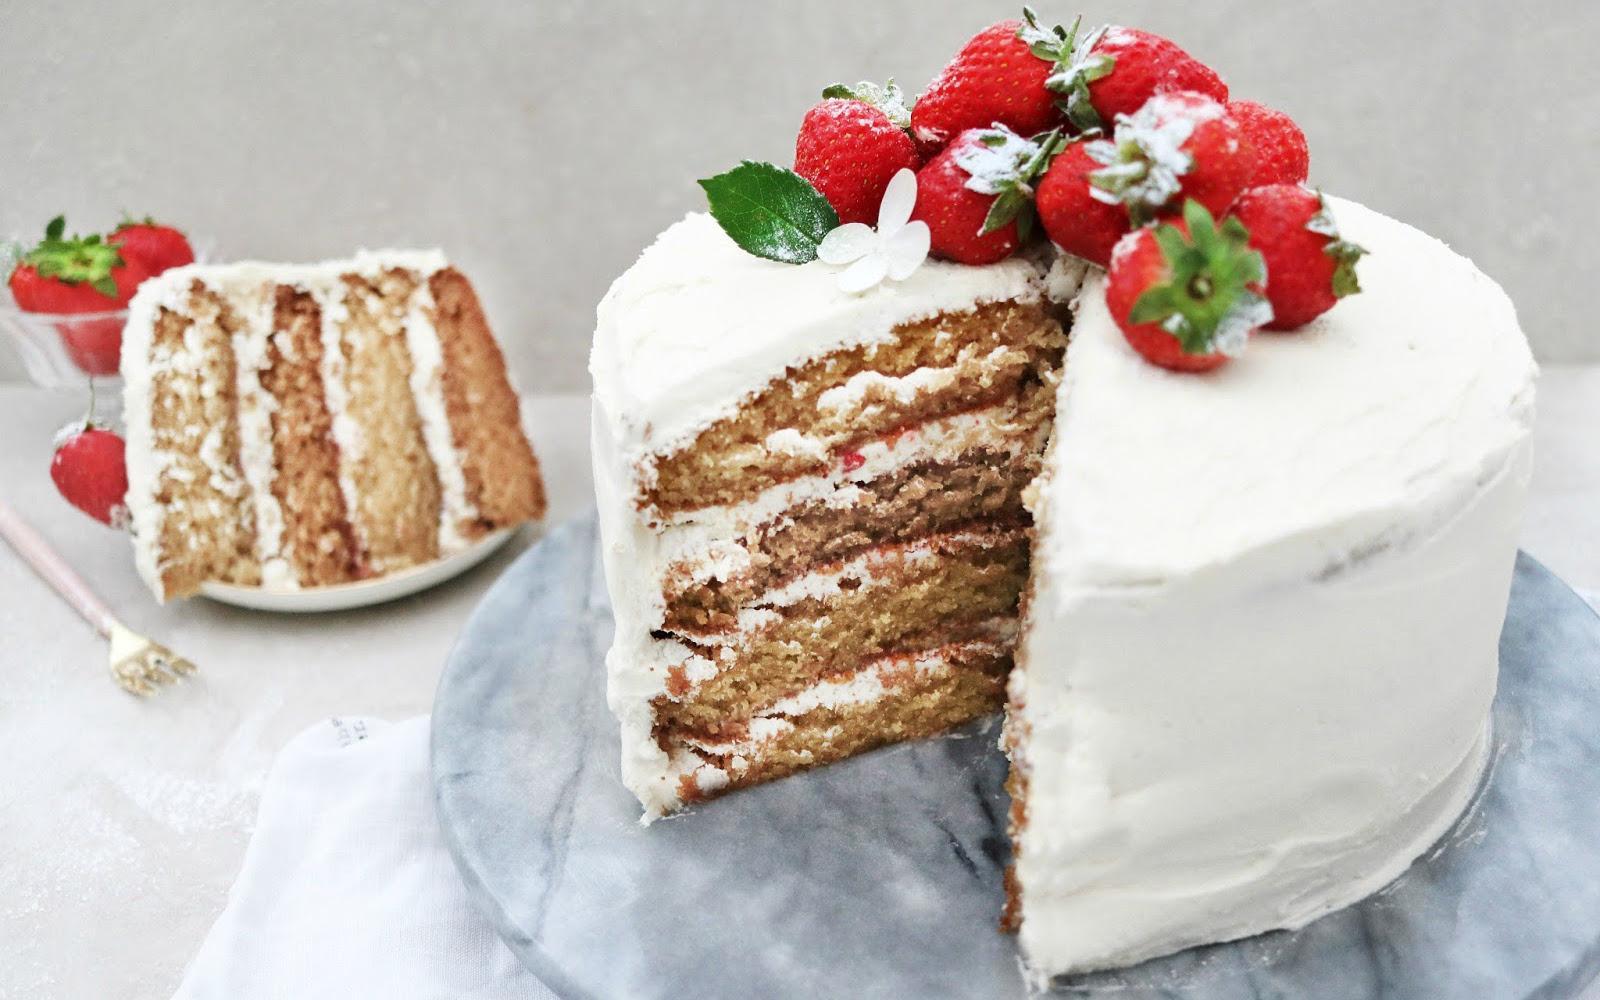 Vegan Jelly Cake Recipe: Vanilla Sponge Cake With Buttercream Frosting And